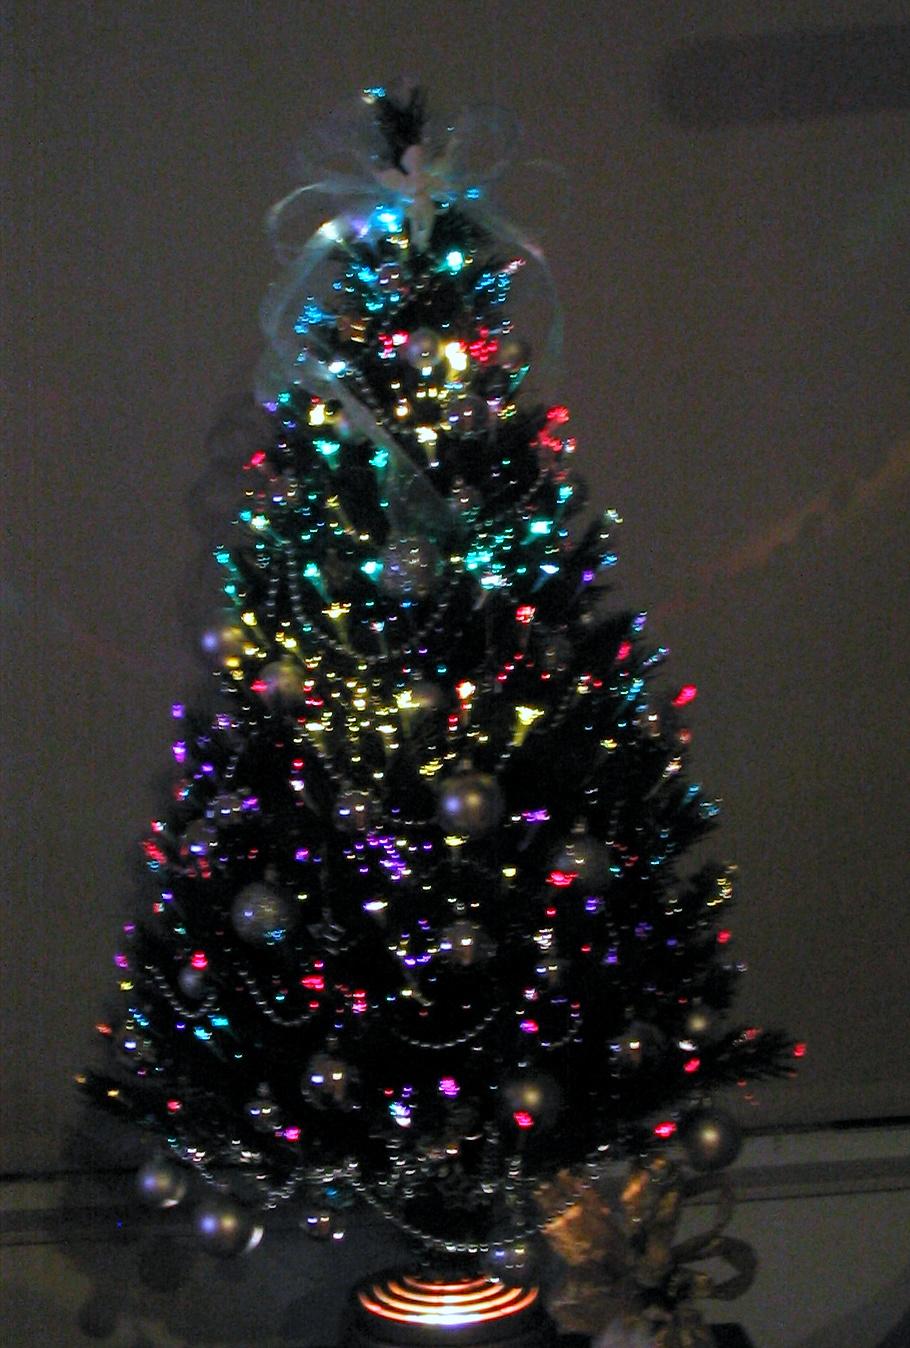 A Beader's Blog: Fiber Optics - Tiny Tree but Amazing Lights!